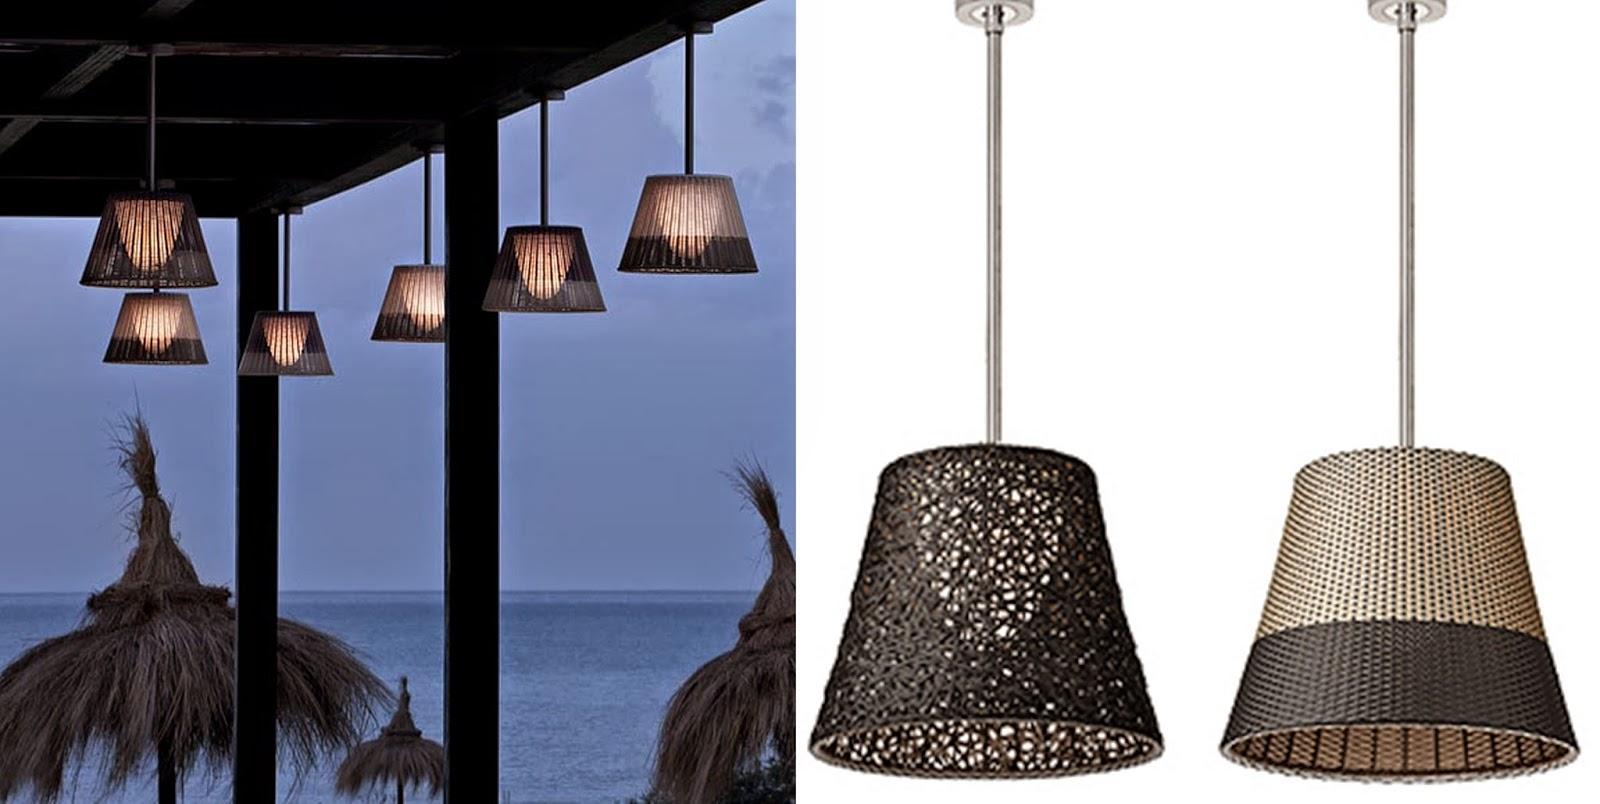 Lampade Per Esterno Ikea Lampade Da Terra Ikea Con Lampade Ikea